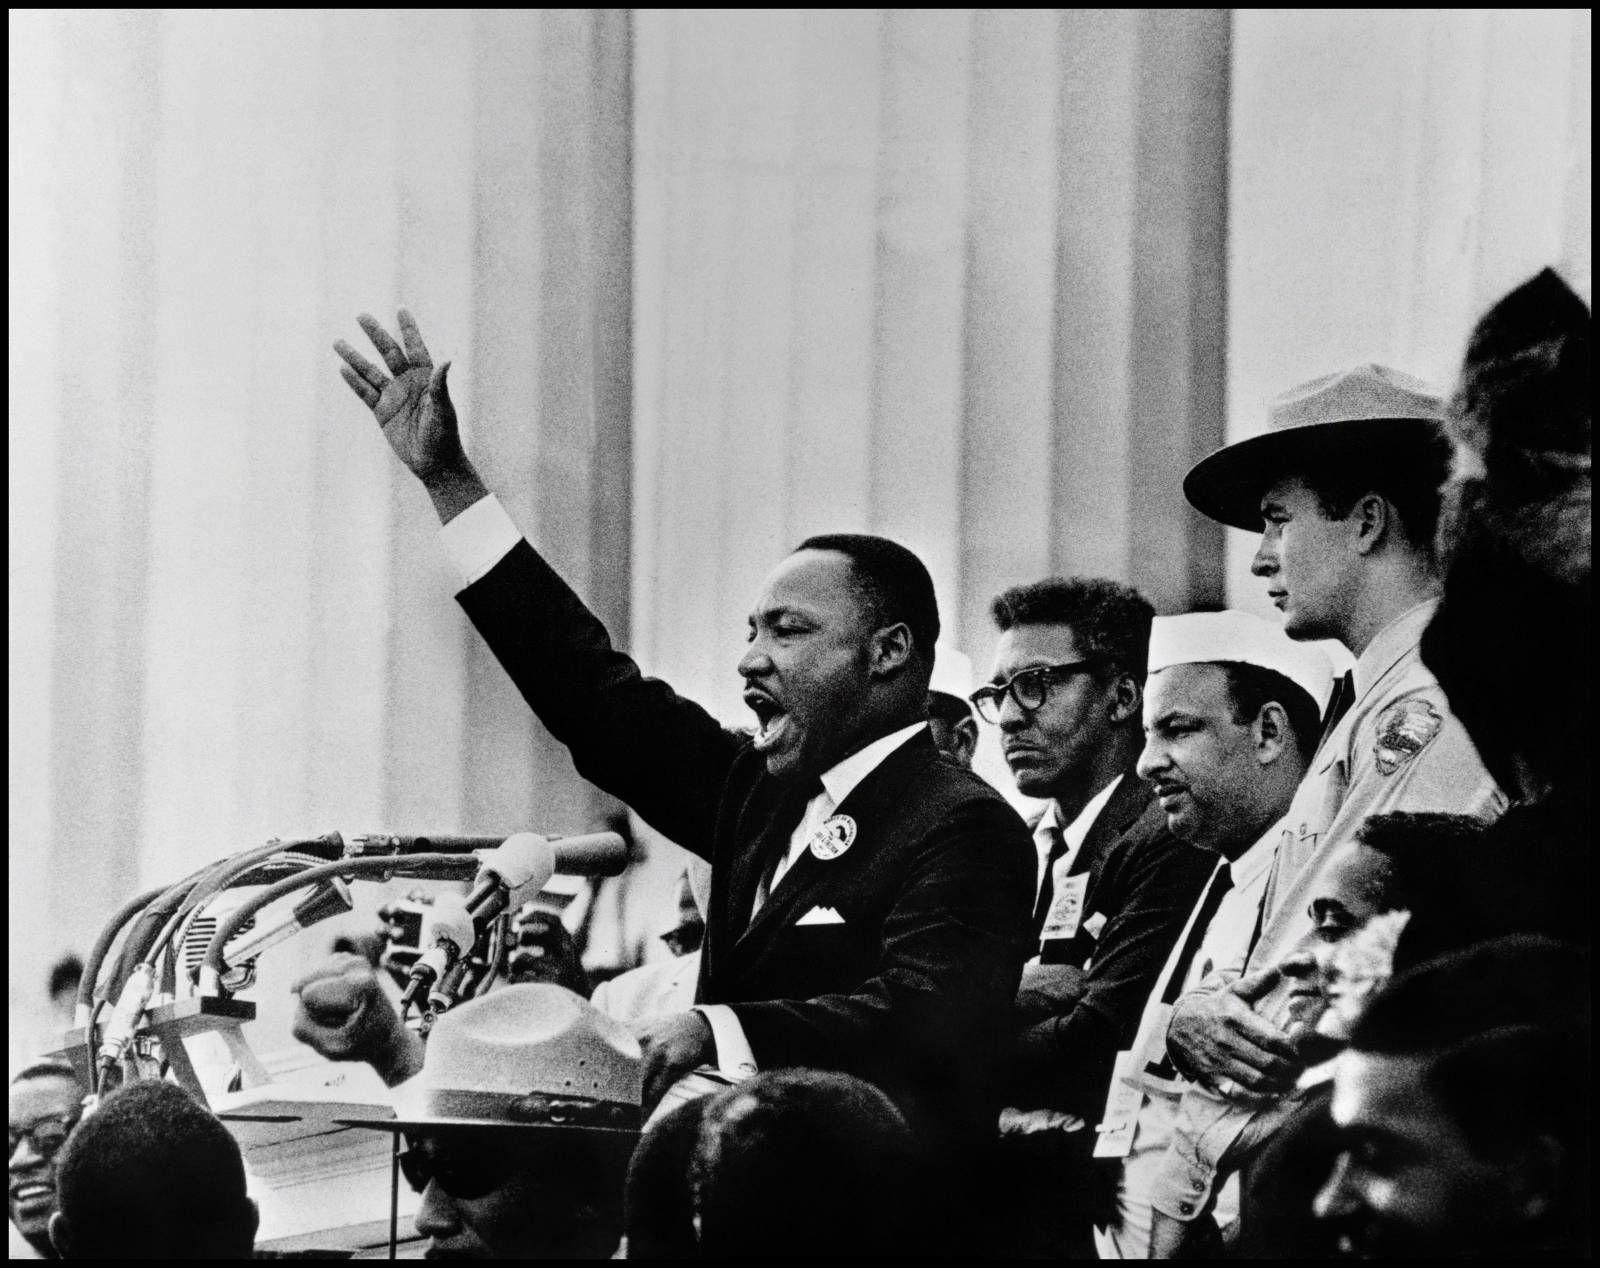 TRIUMF: Martin Luther Kings drømmer triumferte over alle forestillinger om at undertrykte mennesker alltid ville måtte bli «der nede». FOTO: Nobels Fredsenter